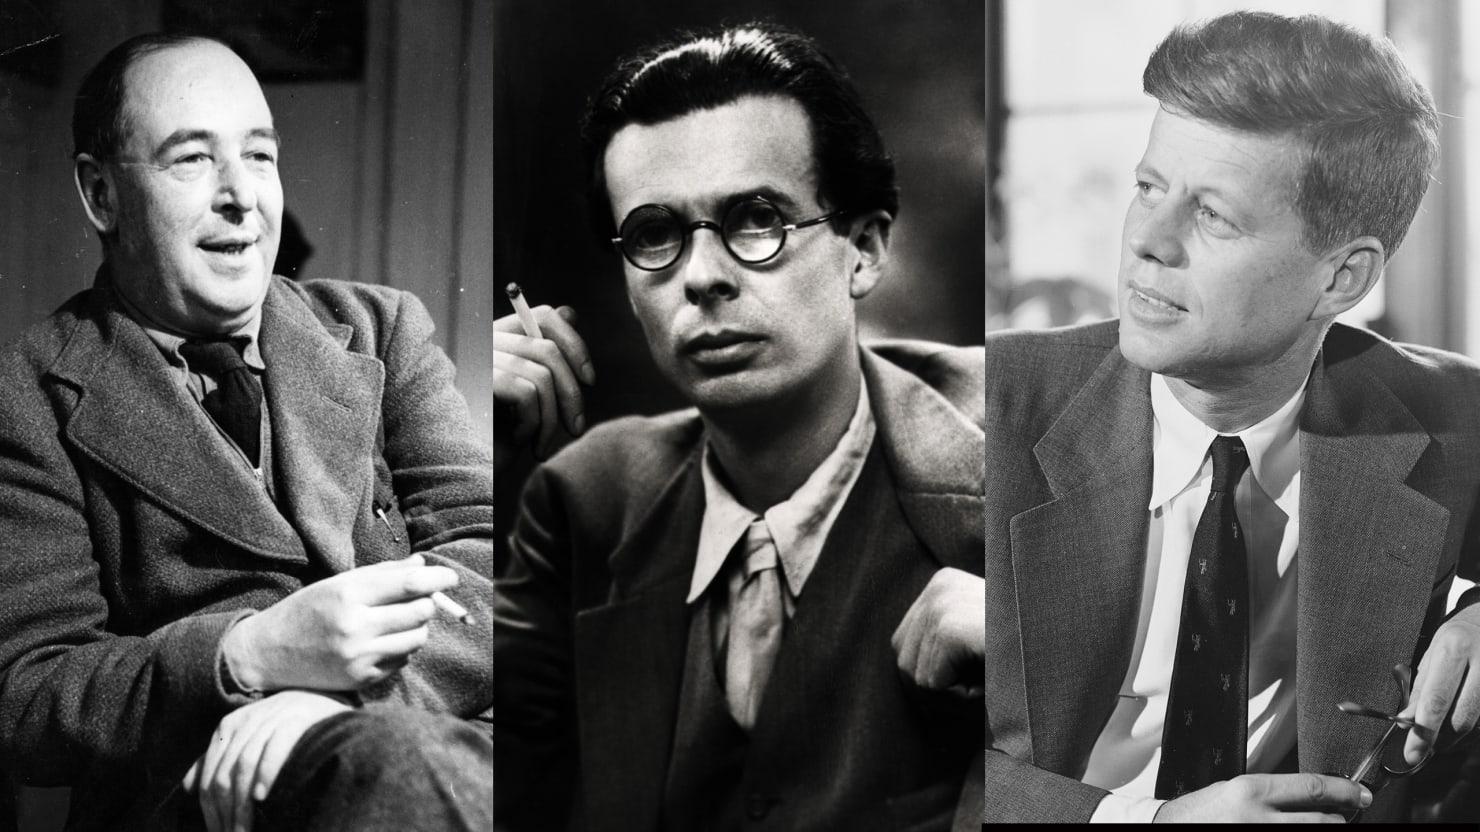 Soviet actors who died in oblivion 84